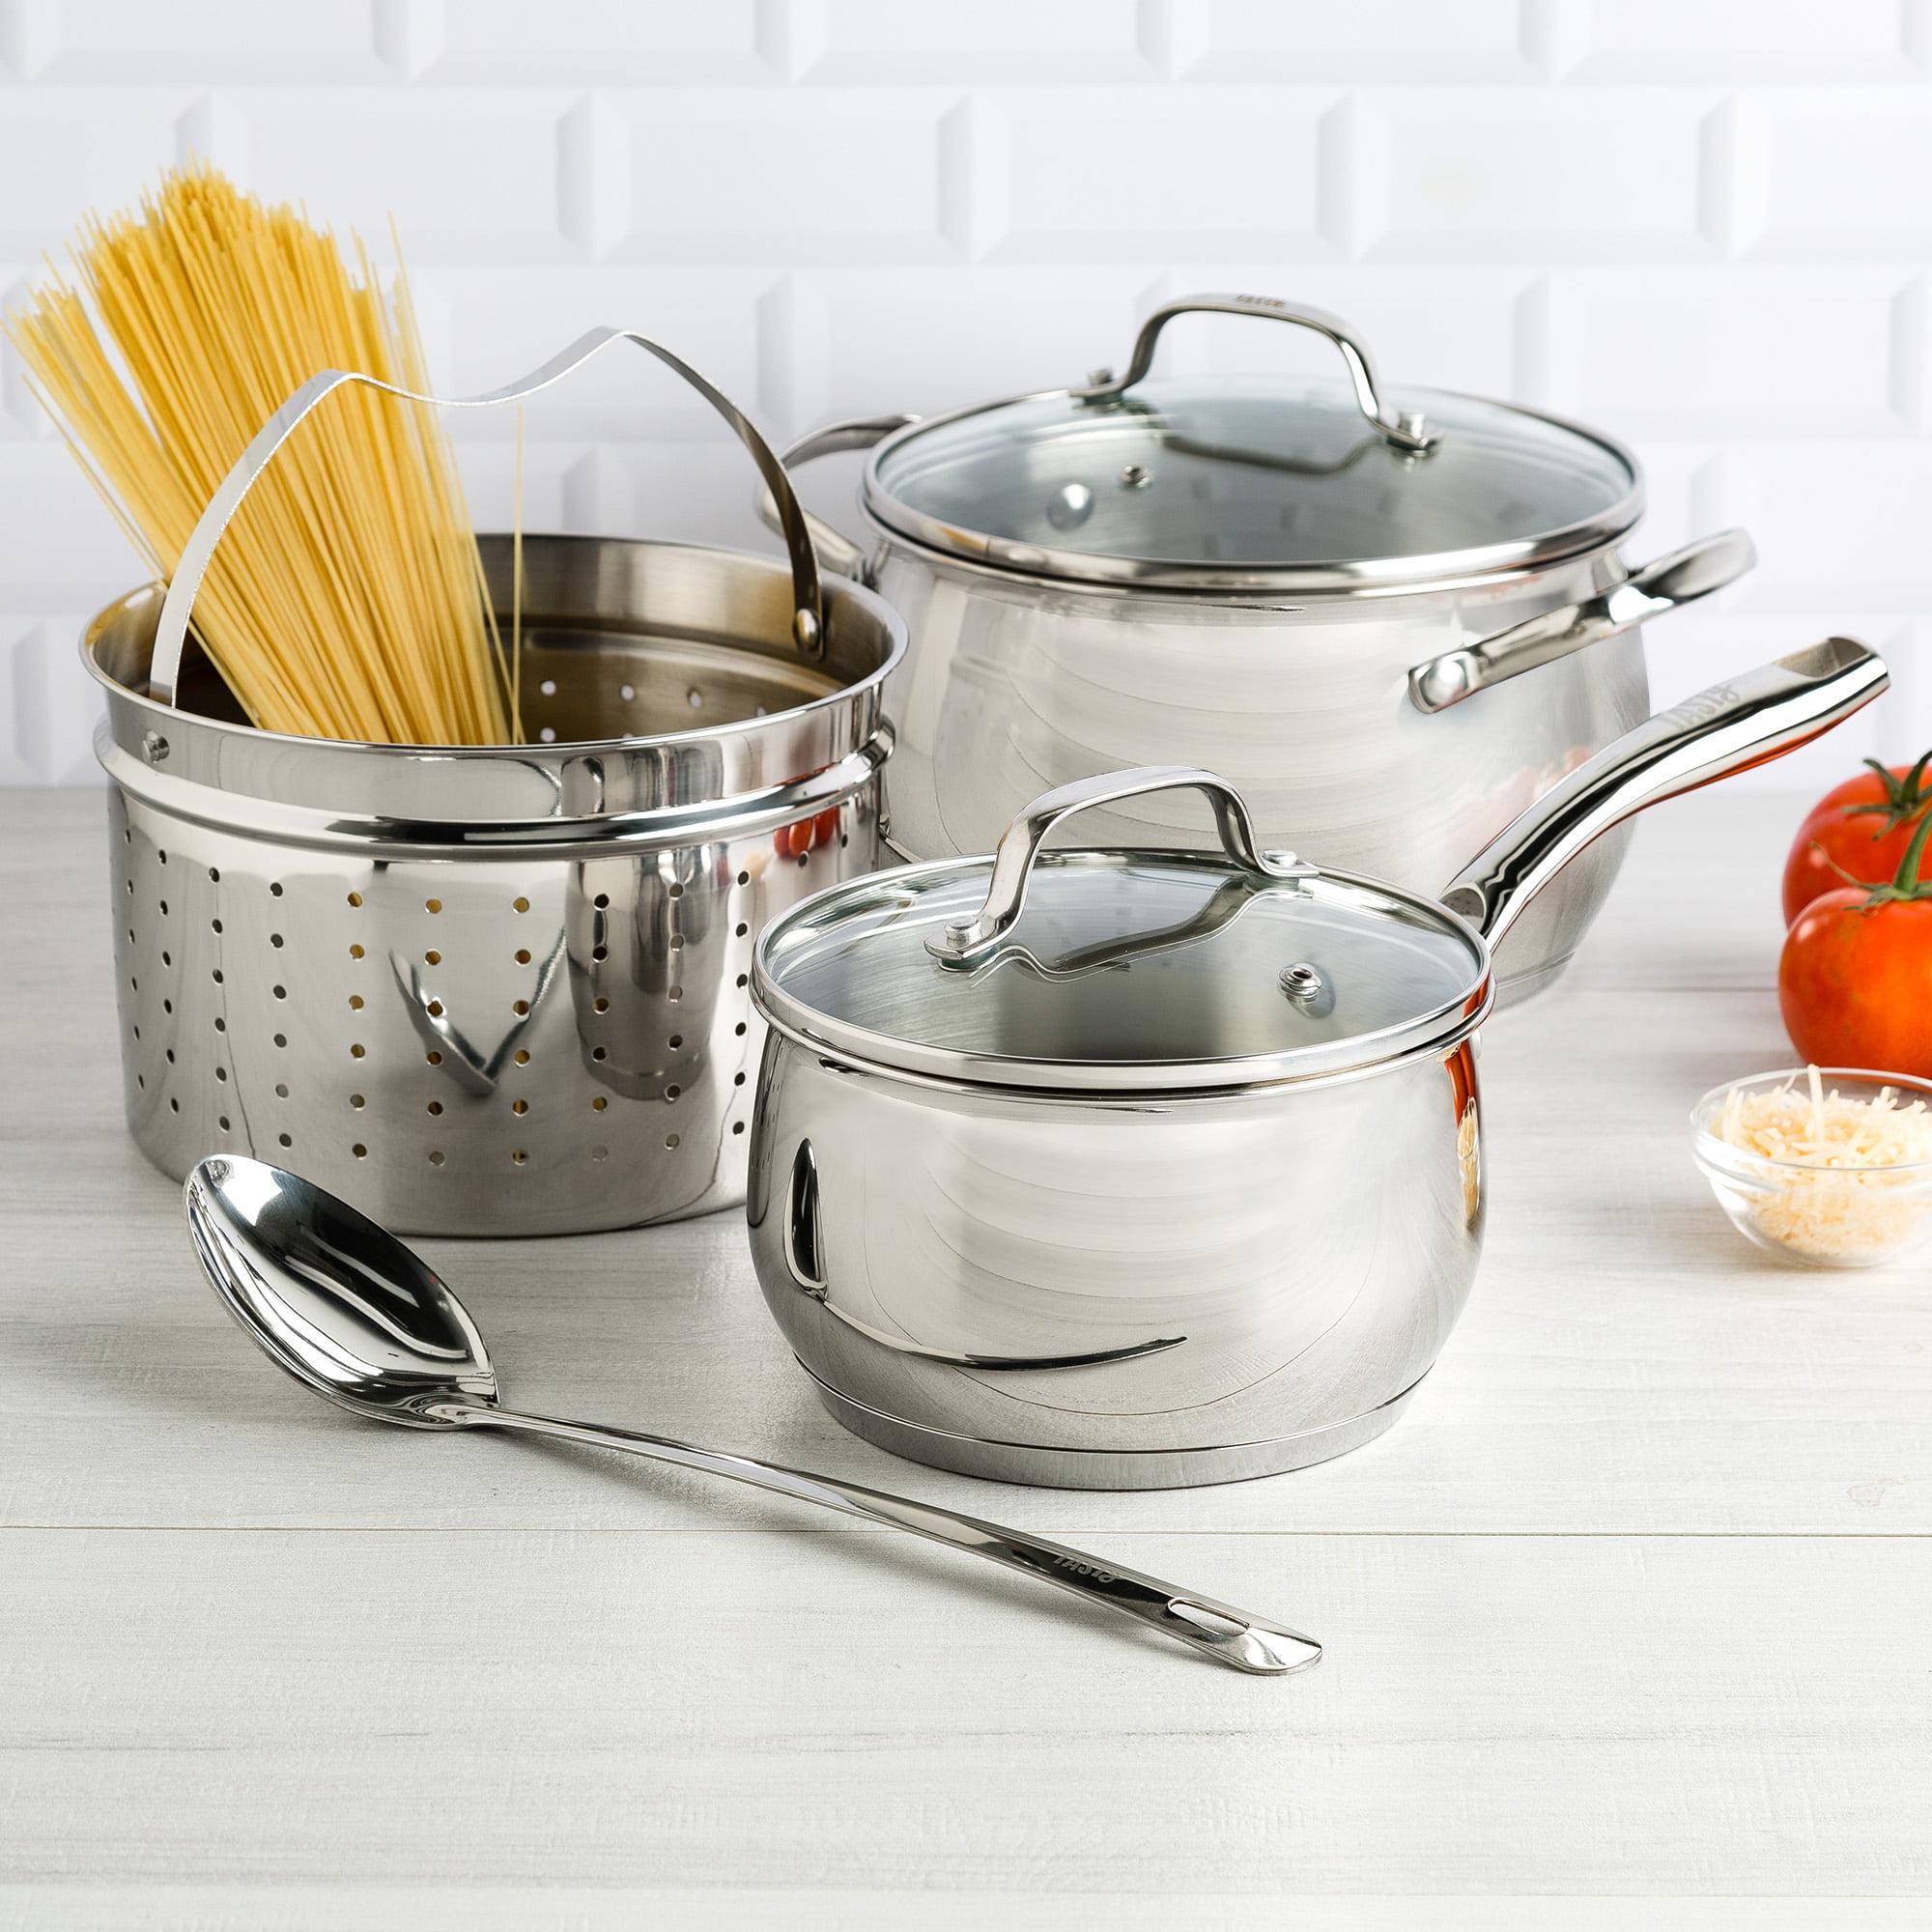 Tasty 6 Piece Premium Stainless Steel Cookware Set